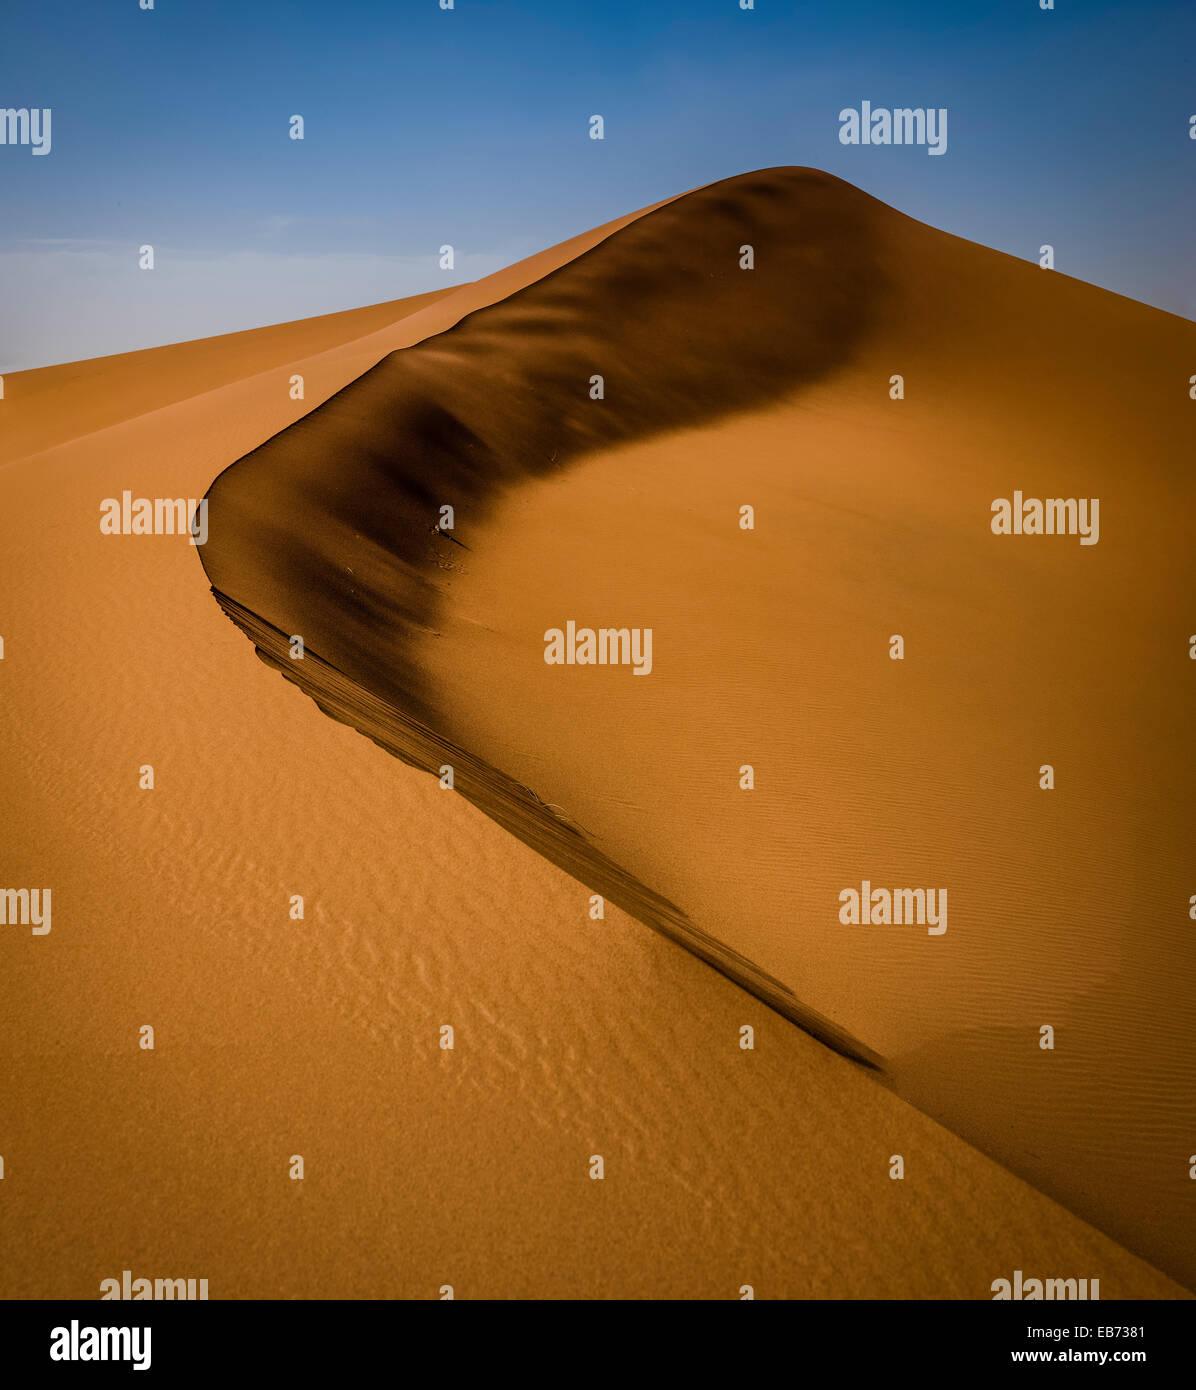 El desierto de Sahara Erg ZHAR Marruecos Africa dunas Imagen De Stock